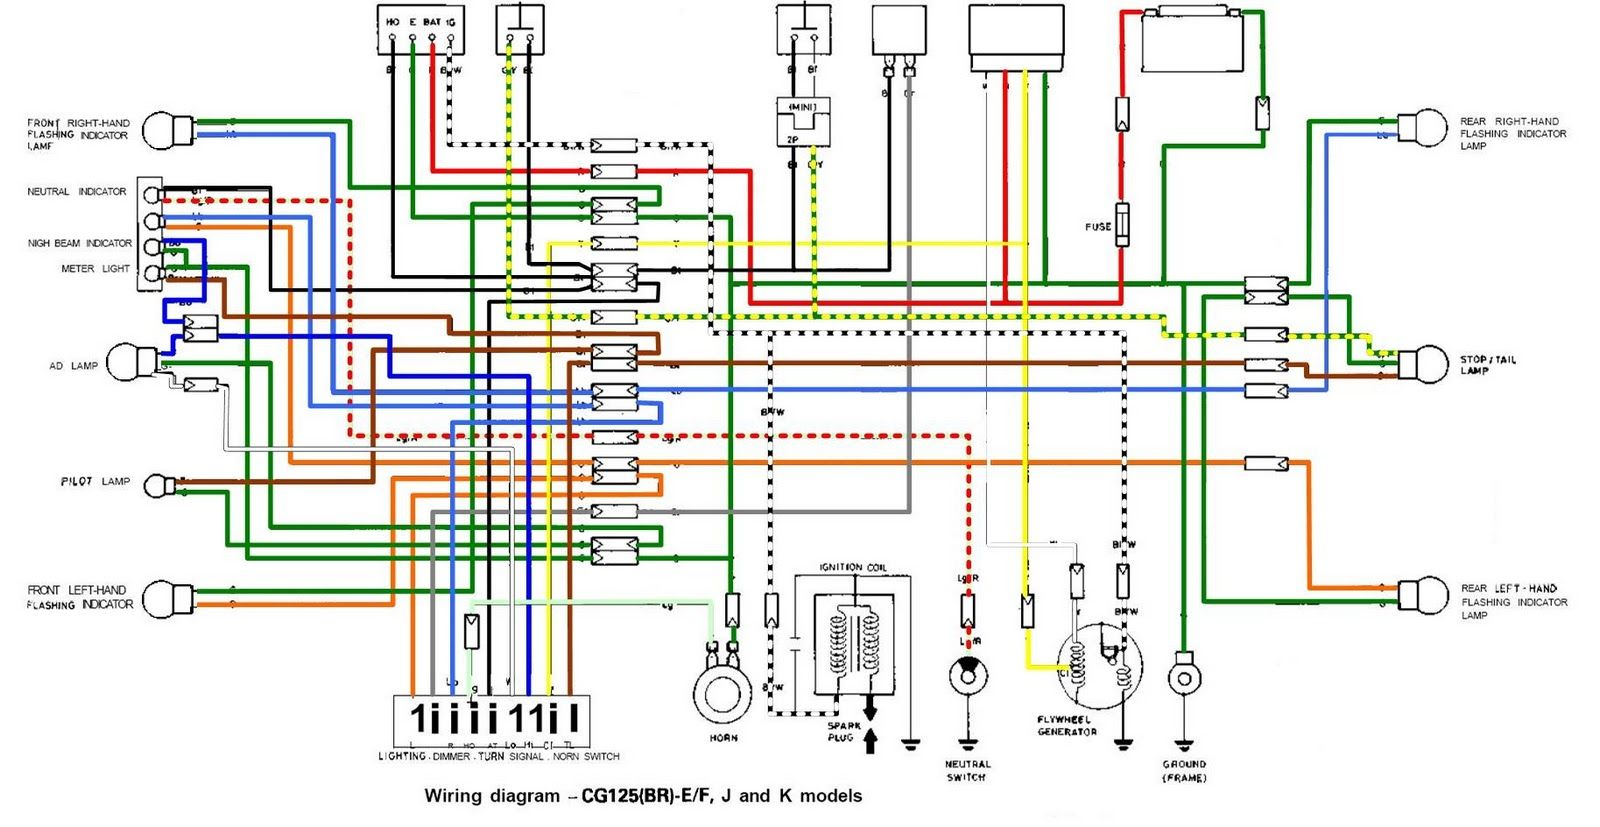 Pin by peter on cafe racer wire elcto | Honda cg125, Diagram, Honda motorcycles